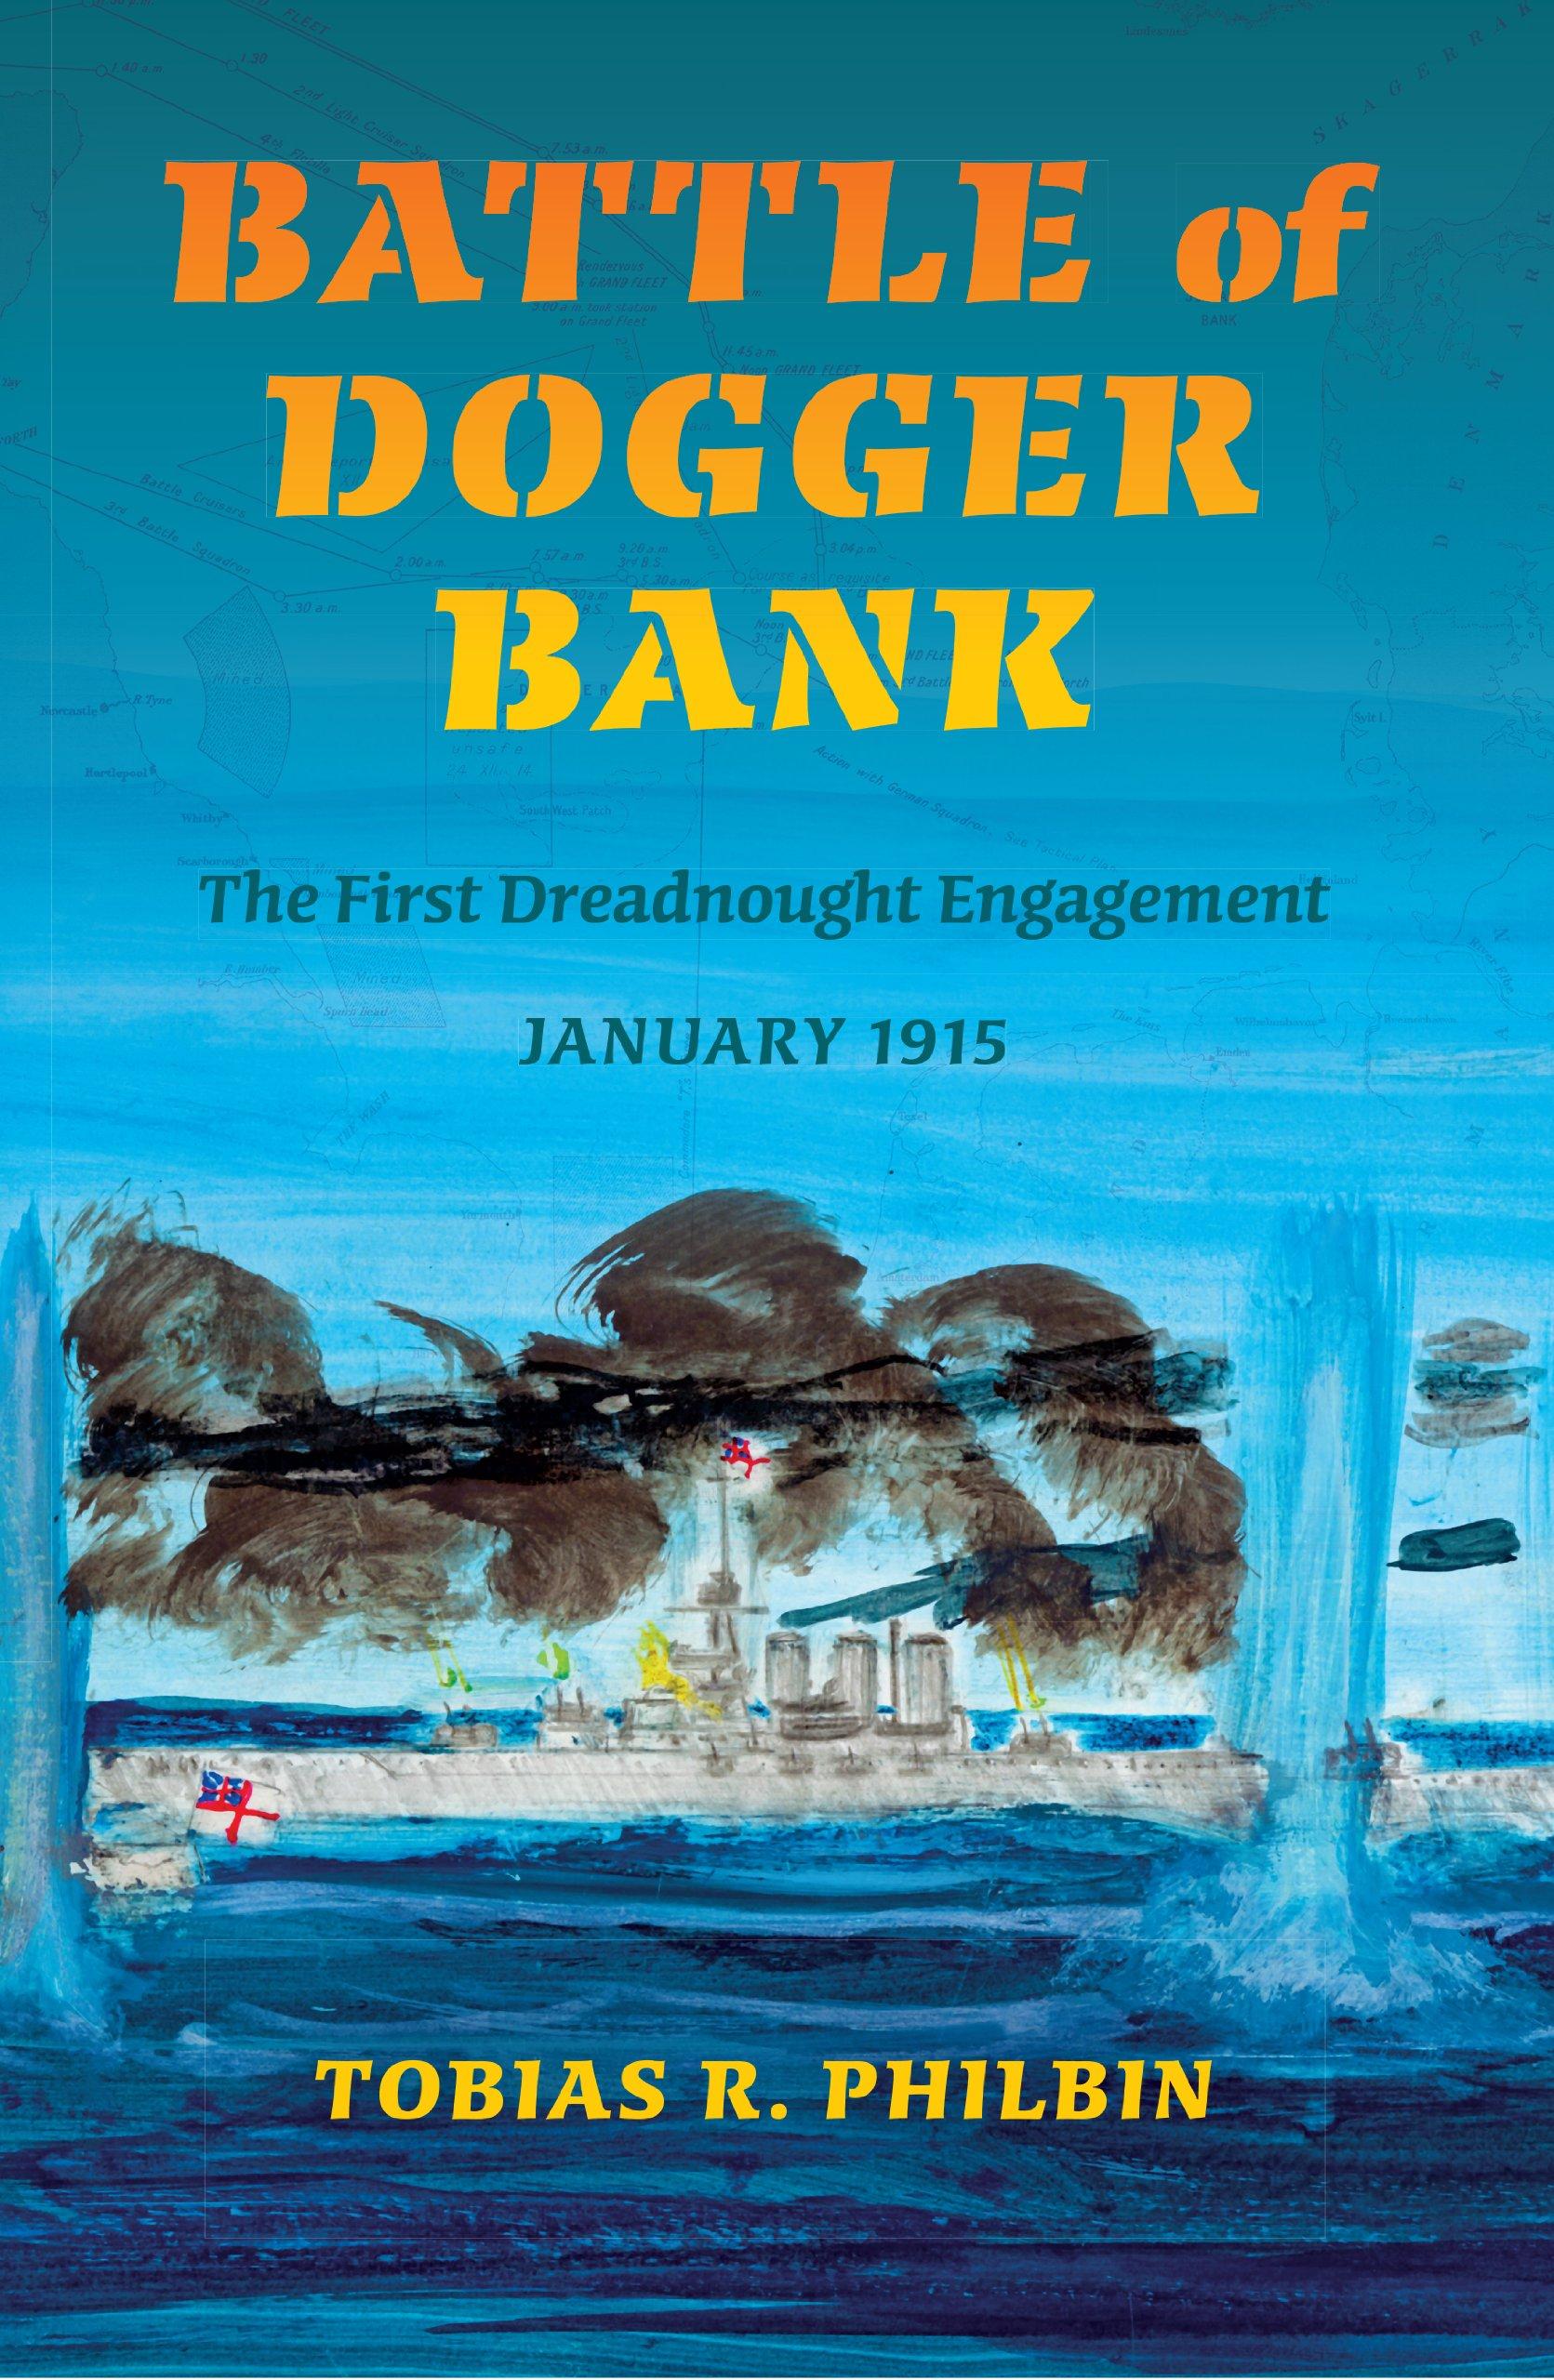 Read Online Battle of Dogger Bank: The First Dreadnought Engagement, January 1915 (Twentieth-Century Battles) pdf epub